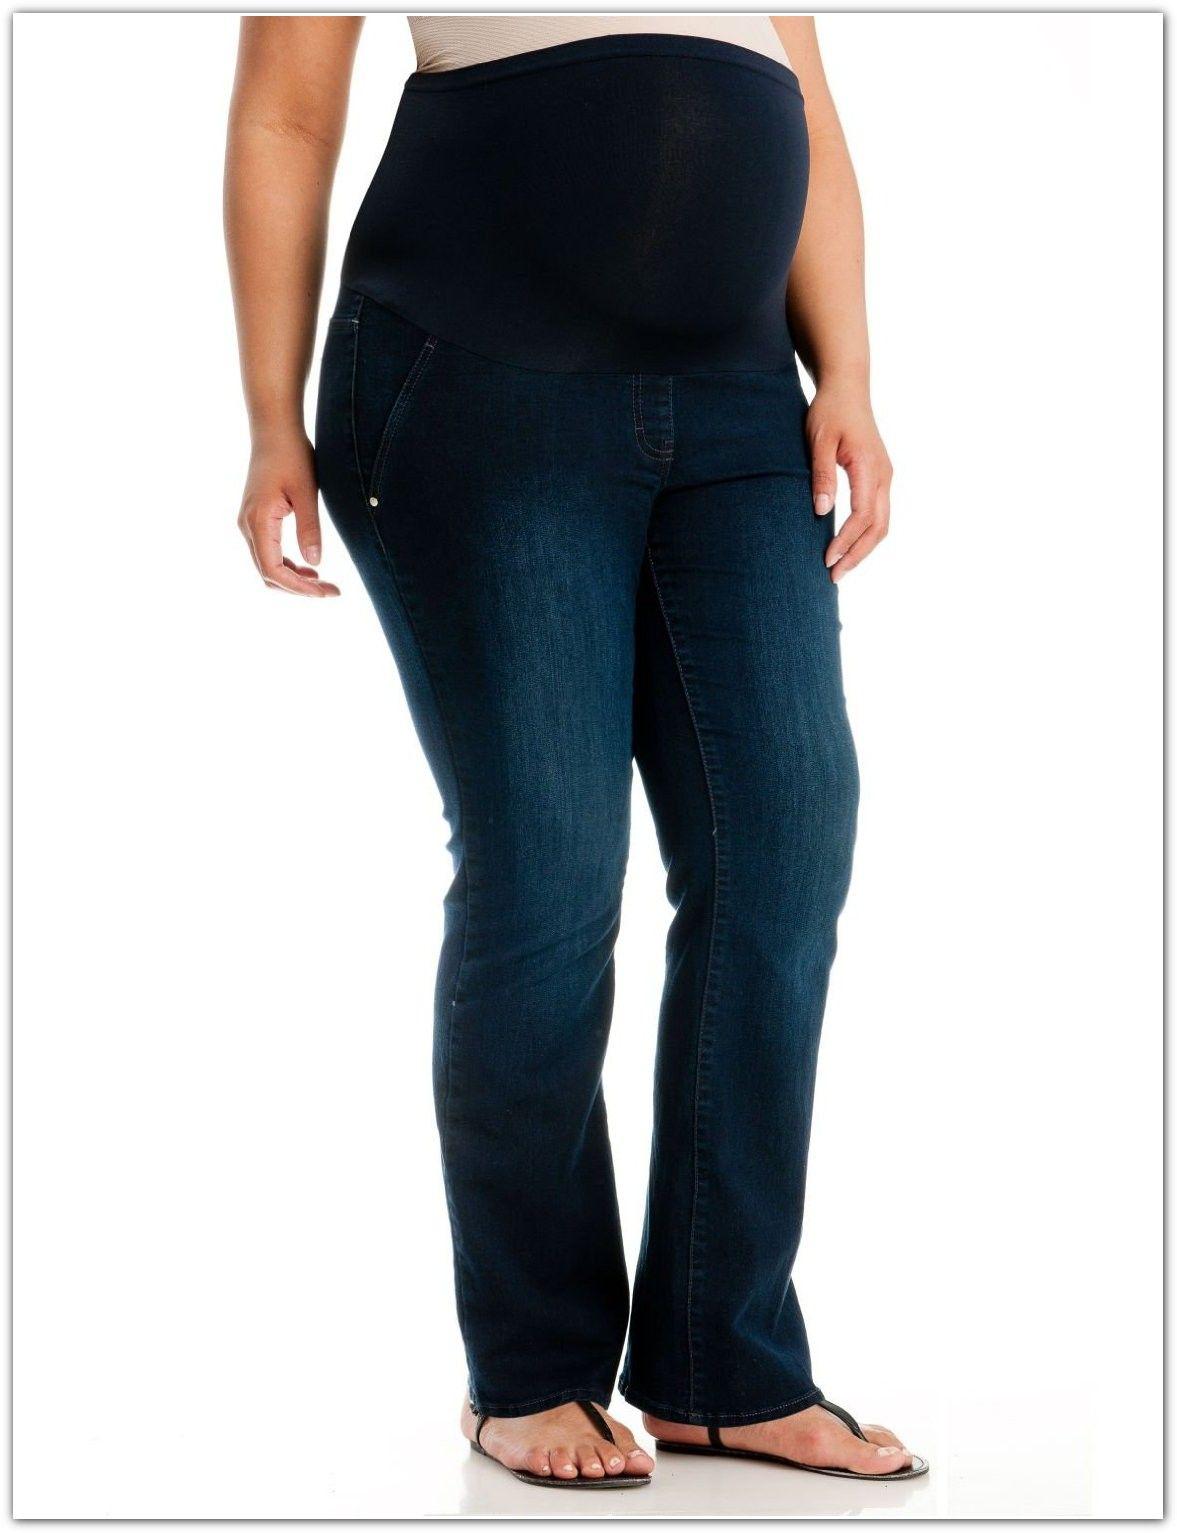 e54726e9ee7e2 The Right Plus Size Maternity Jeans For You